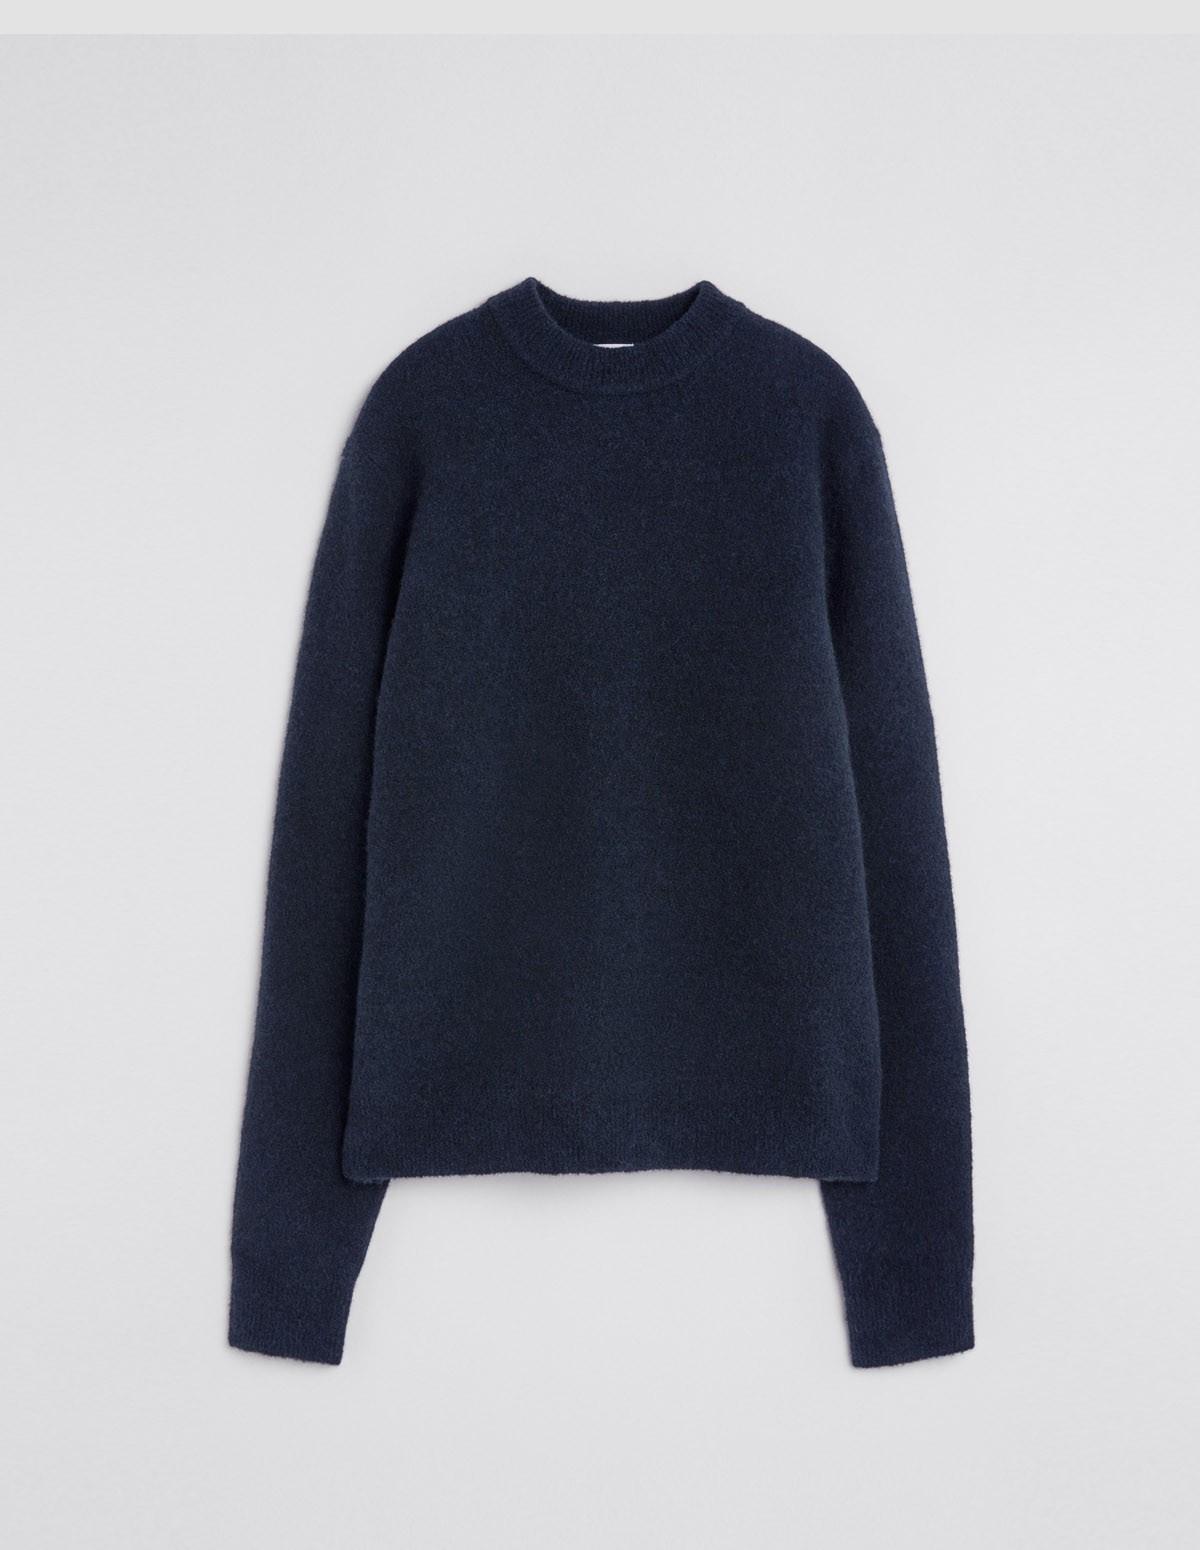 M.johannes Yak Sweater